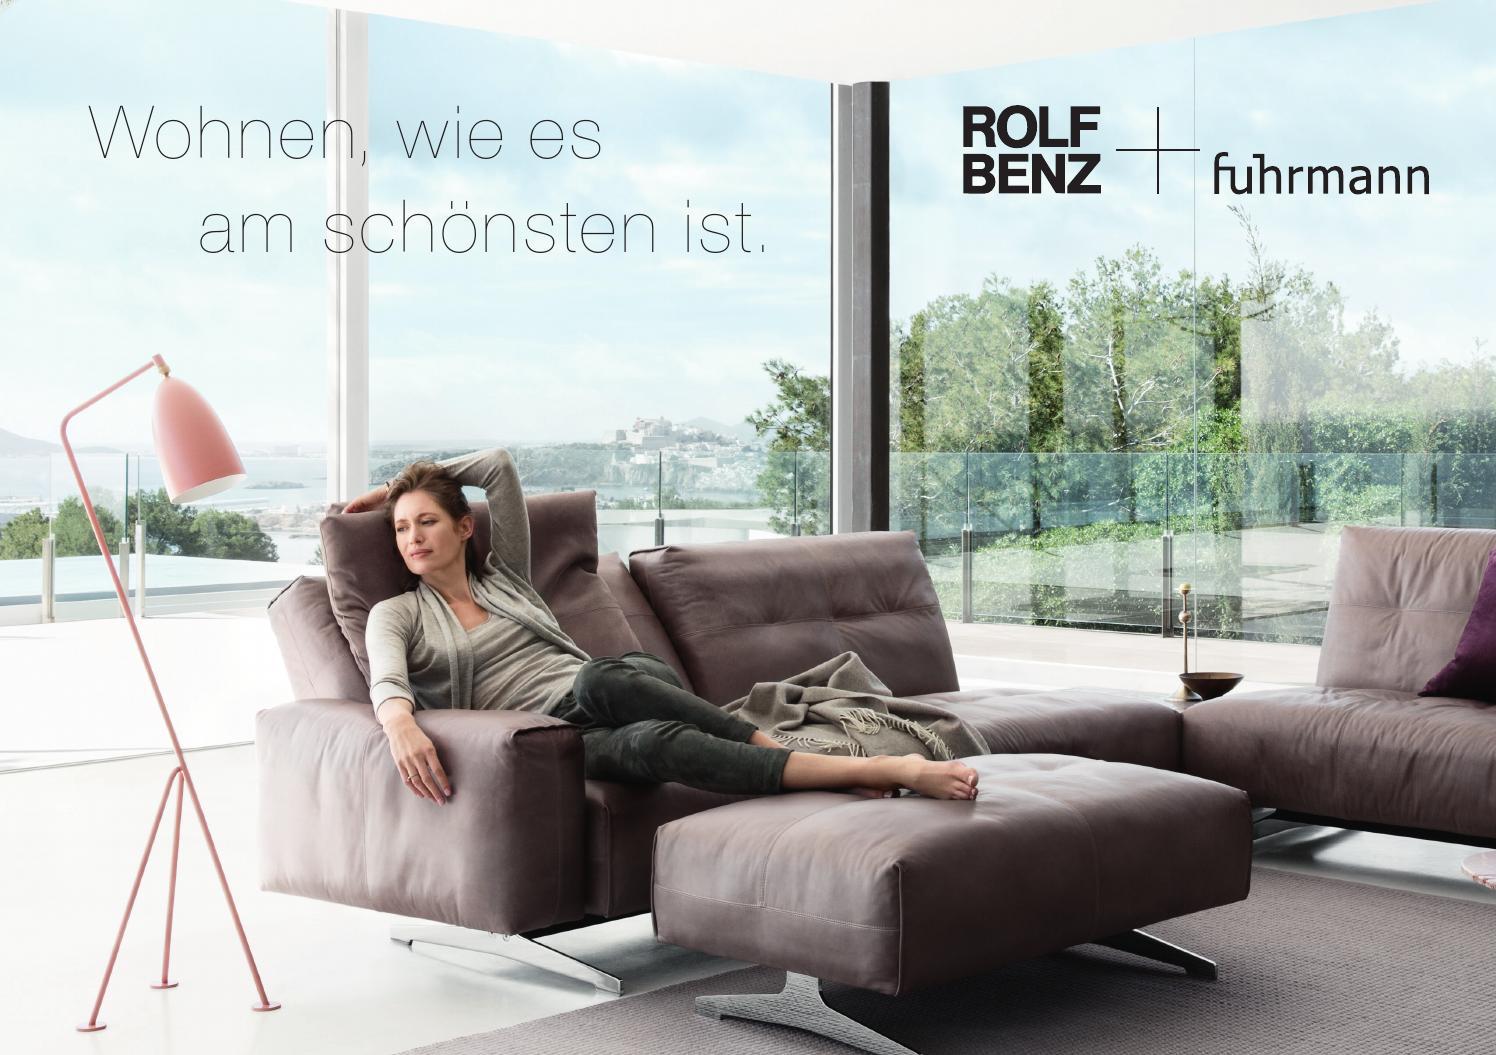 Rolf Benz Fuhrmann Broschüre By Christian Klasan Issuu